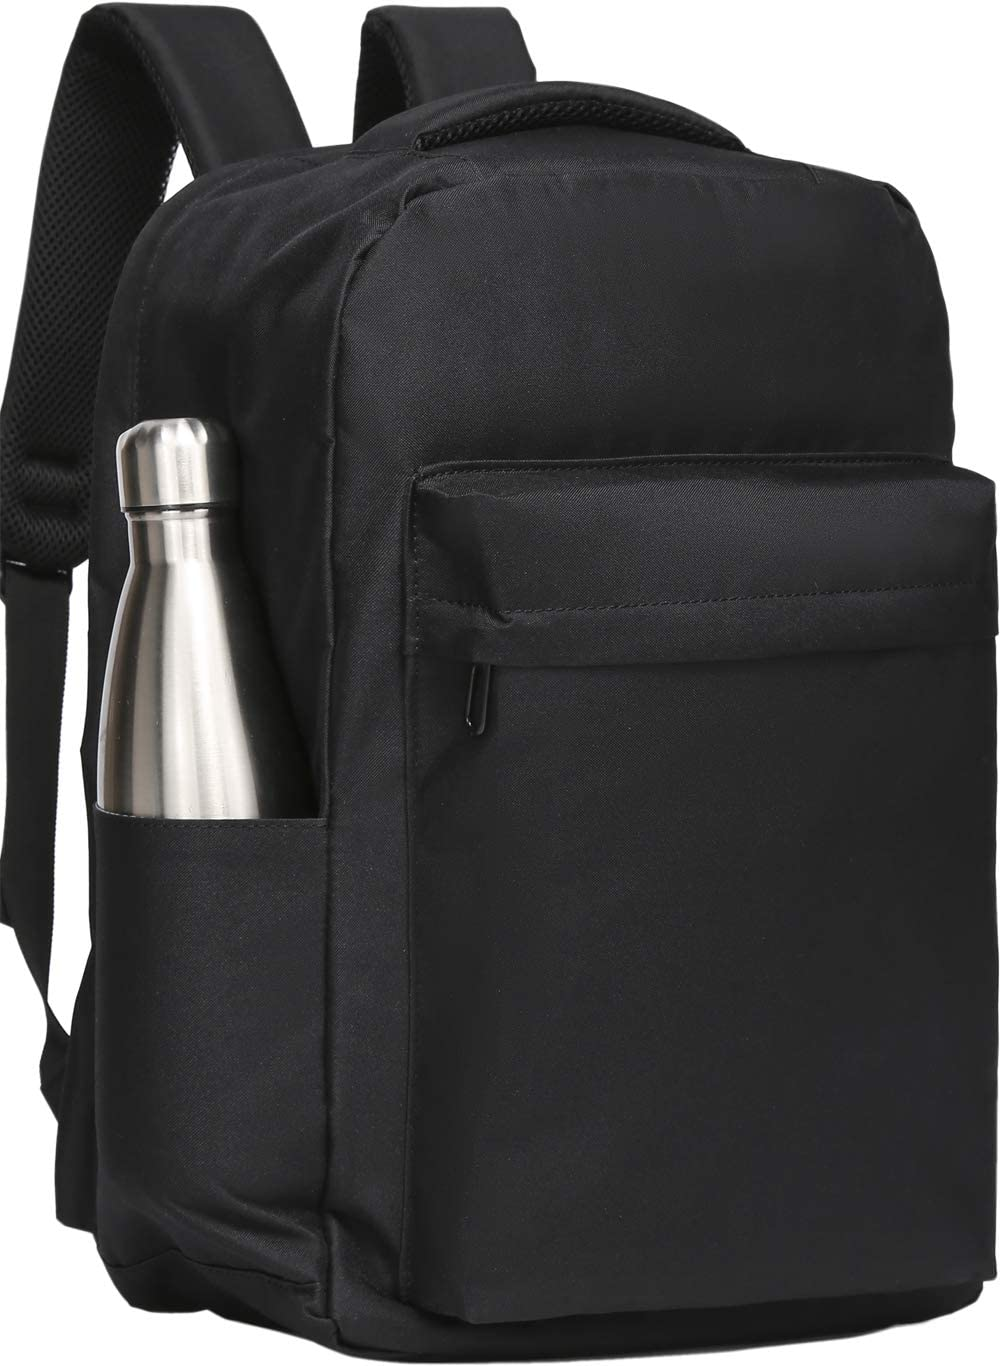 SAKUTANE Laptop Backpack 11 Pockets Waterproof Lightweight 17 inch Laptop Bag Men Women